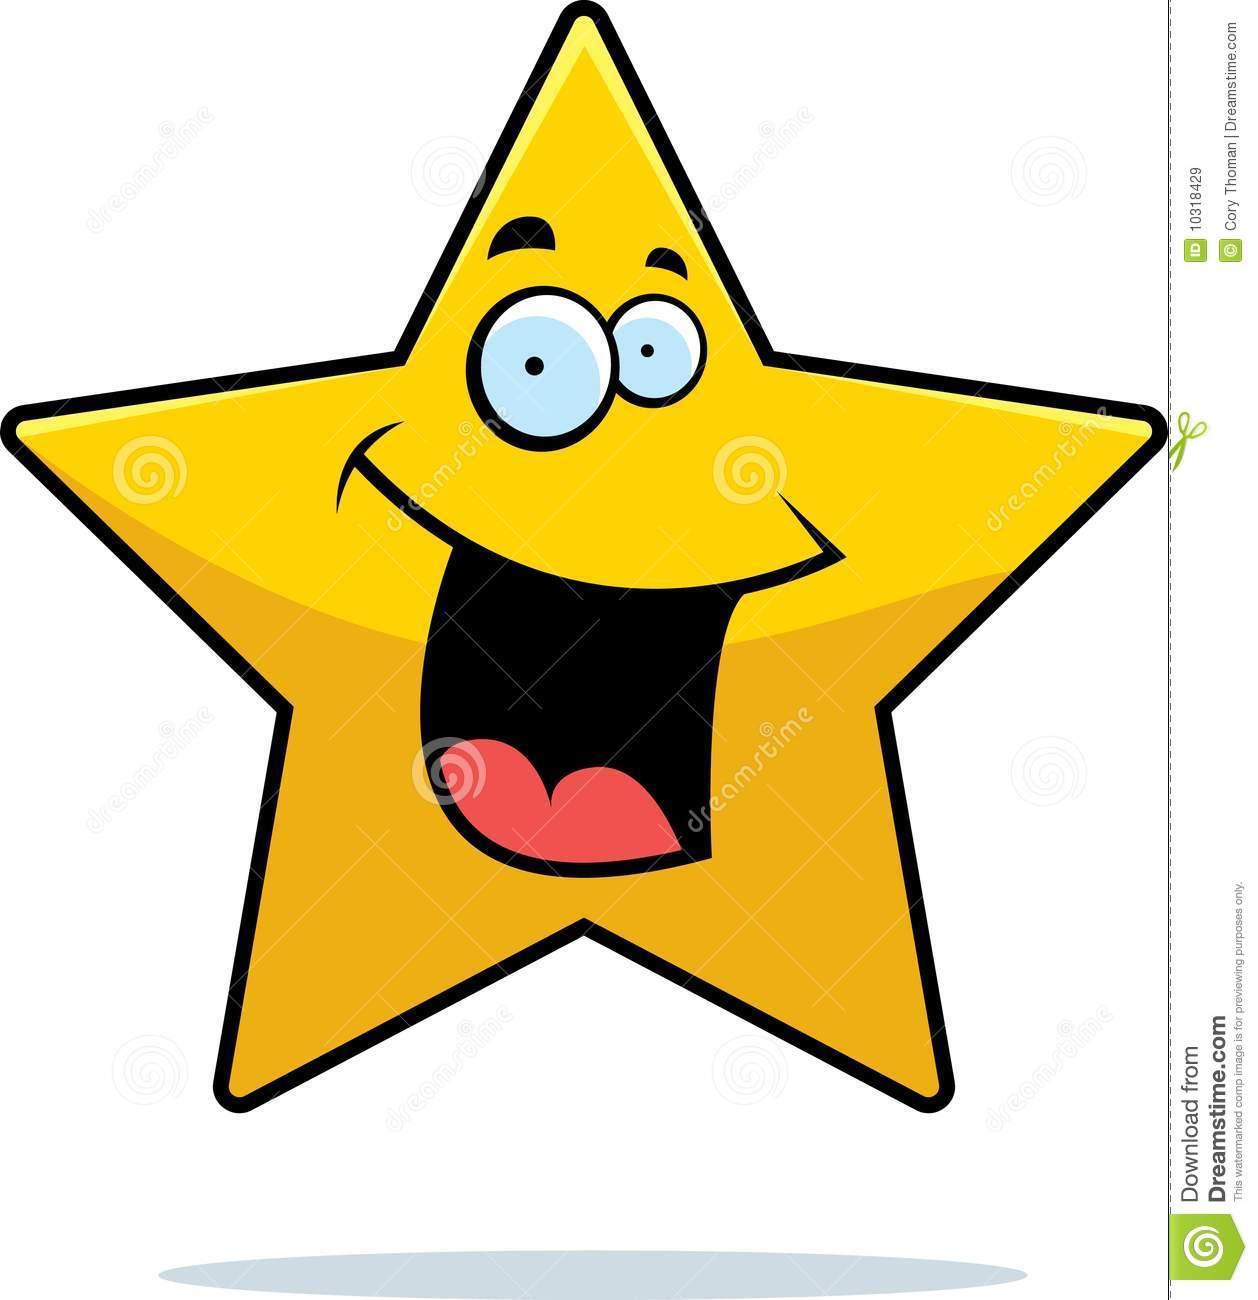 1258x1300 Stars Clipart Thumbs Up